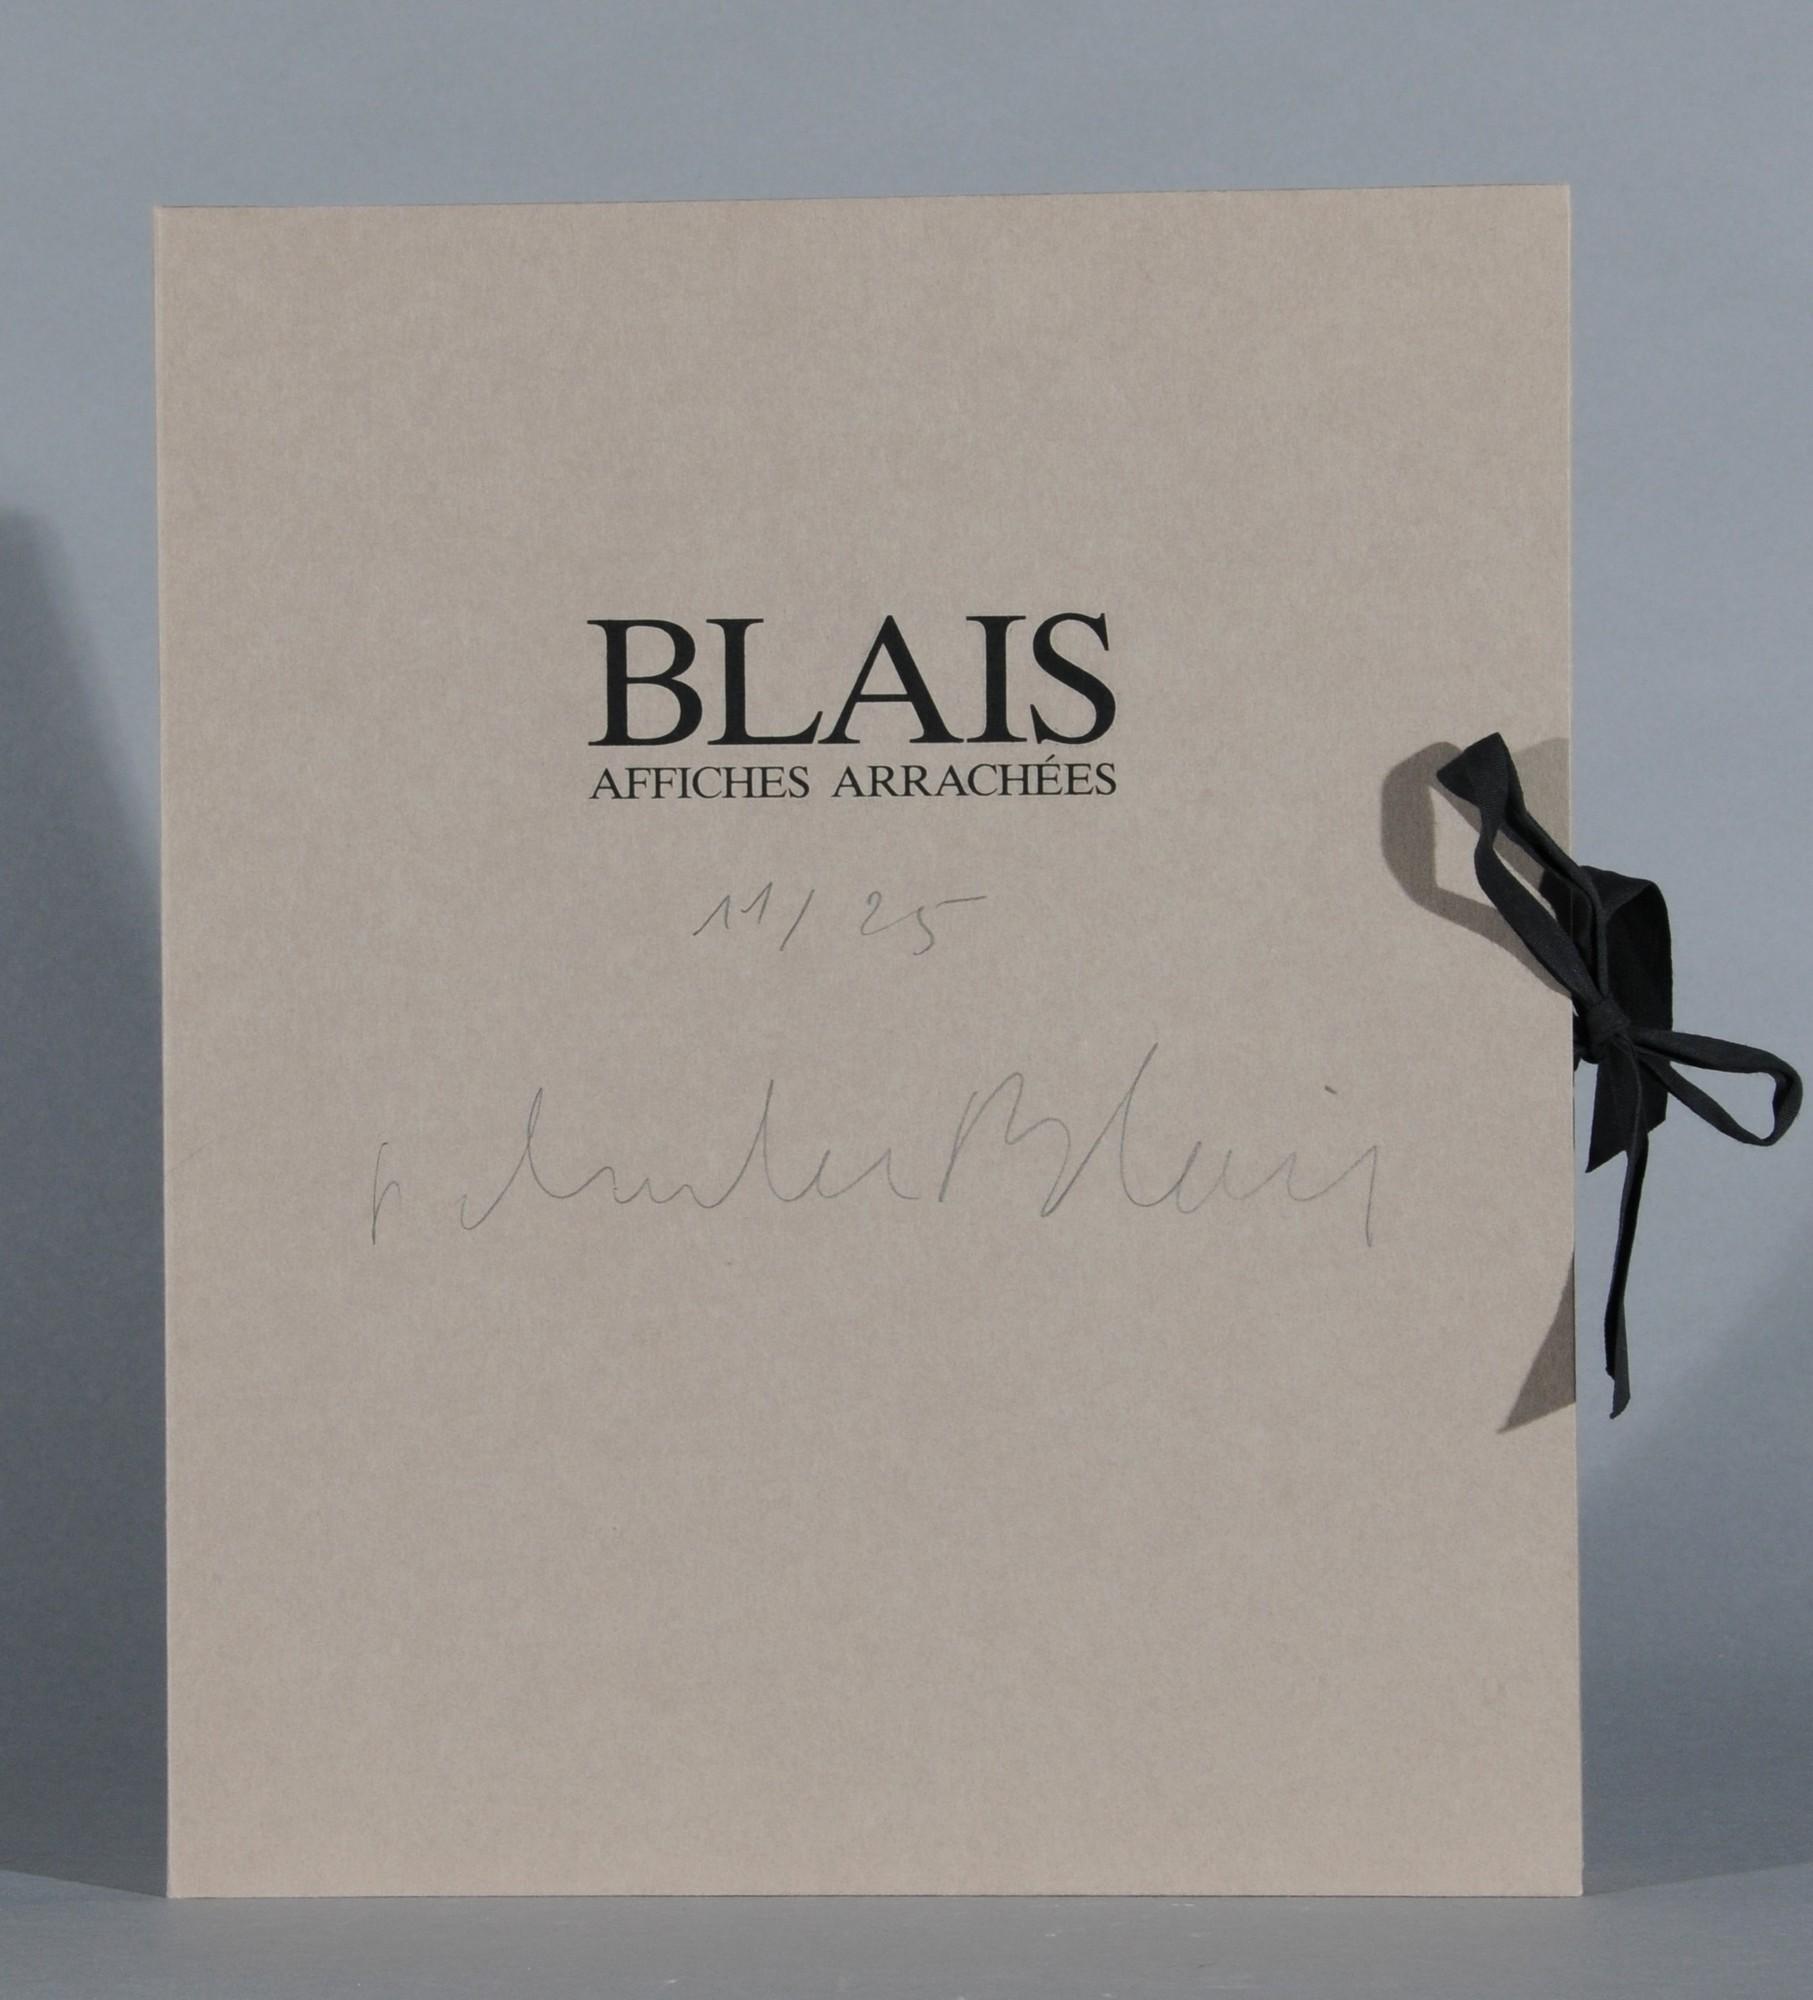 Blais Jean-Charles, Book. Blais, Affiches Arrachées 1981-1990